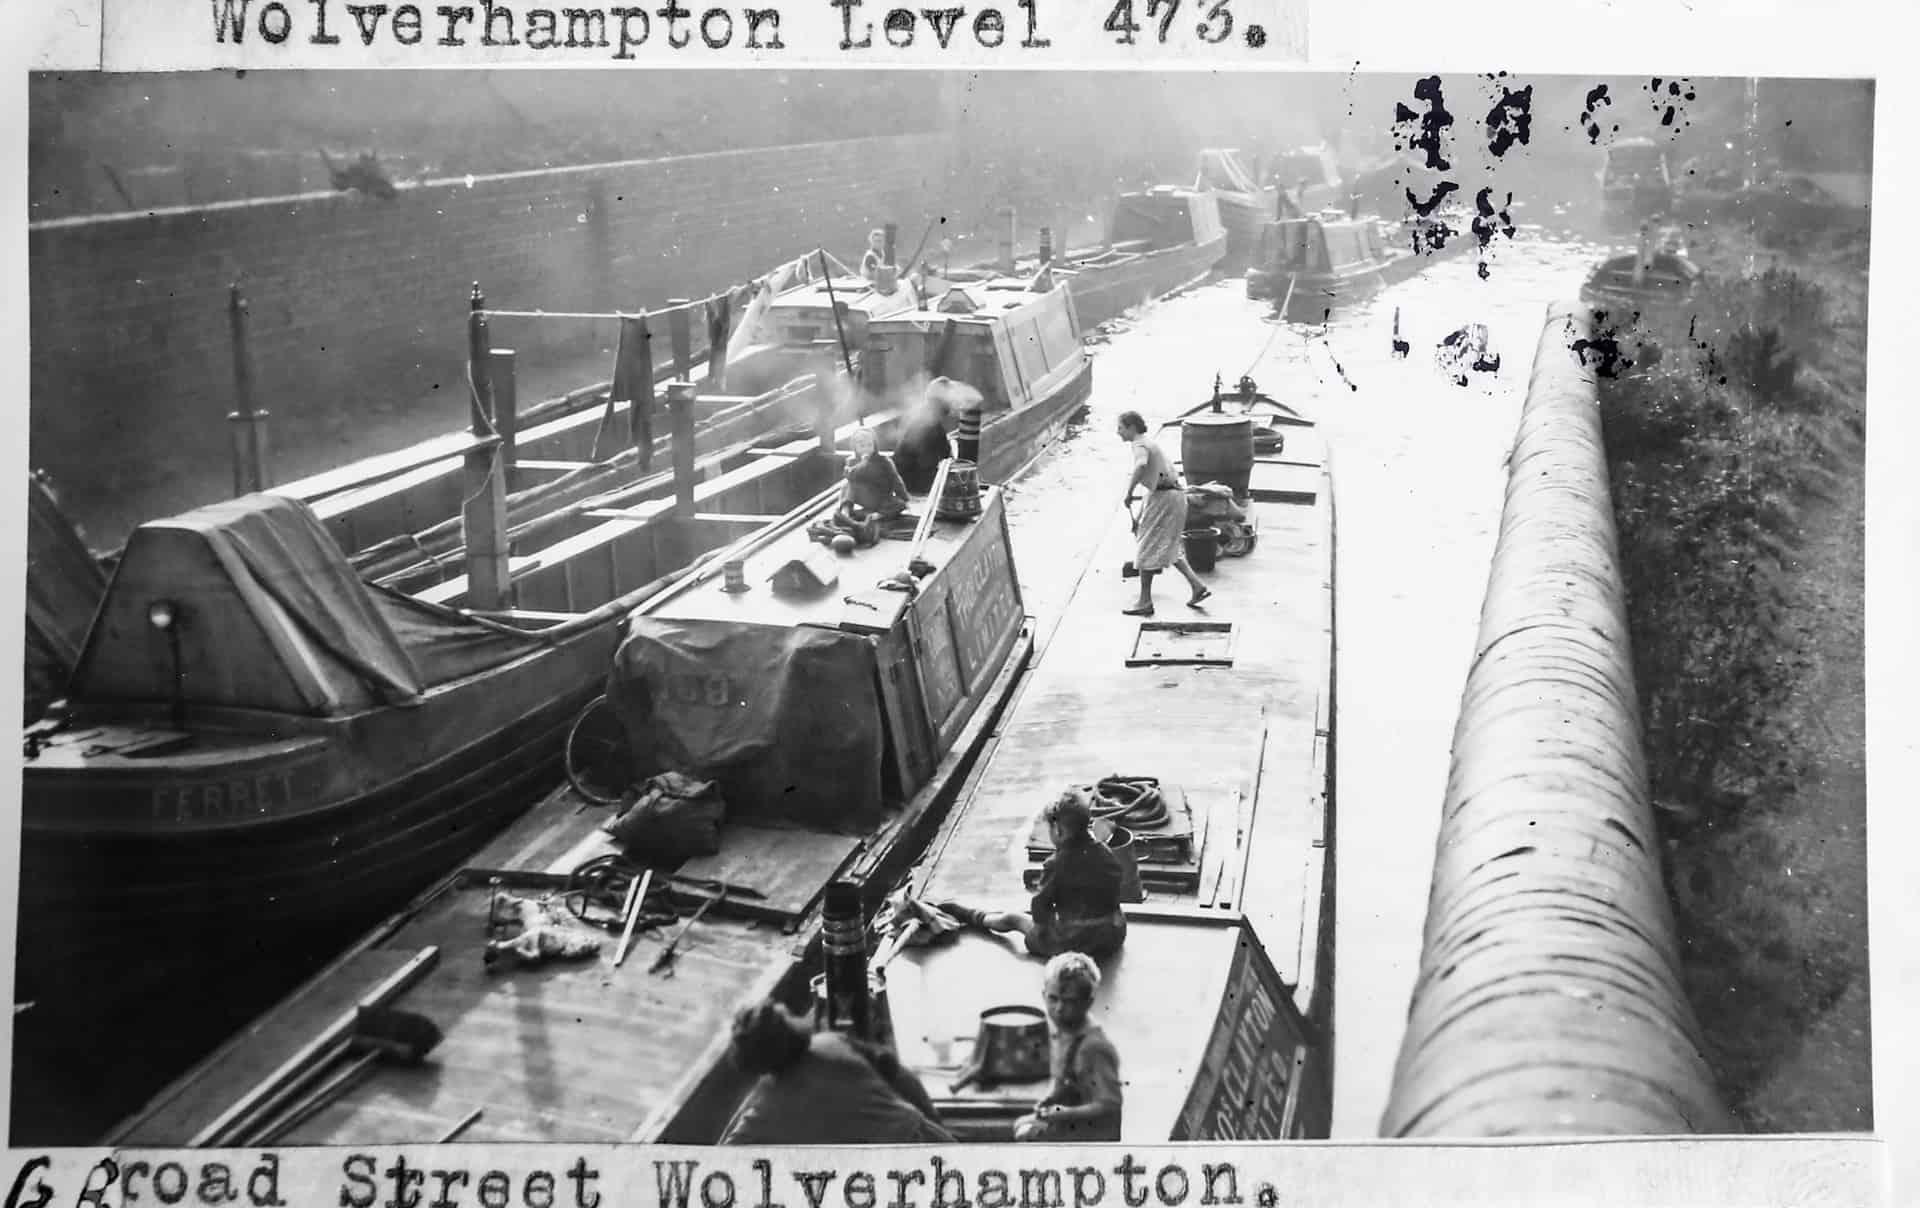 Wolverhampton Level, 473, Broad Street, Wolverampton c 1950s